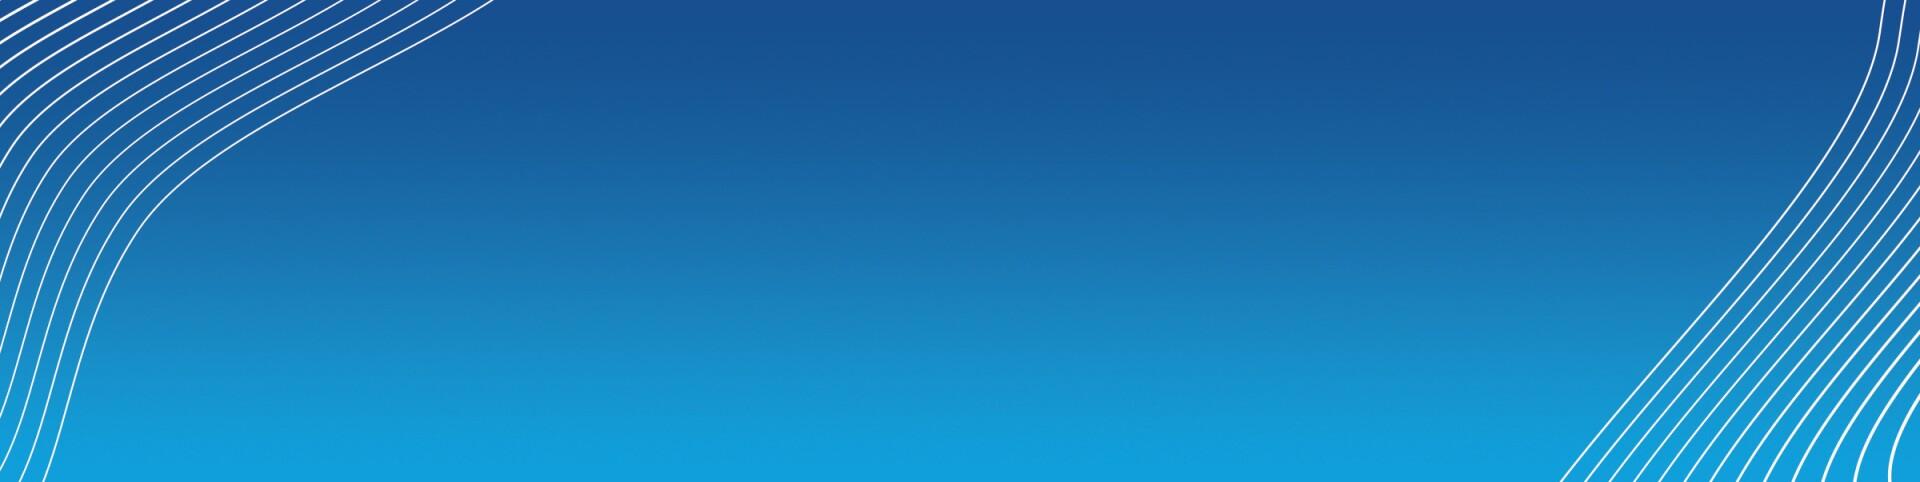 indigo-web-banner-gradient-ripple-3-web.jpg